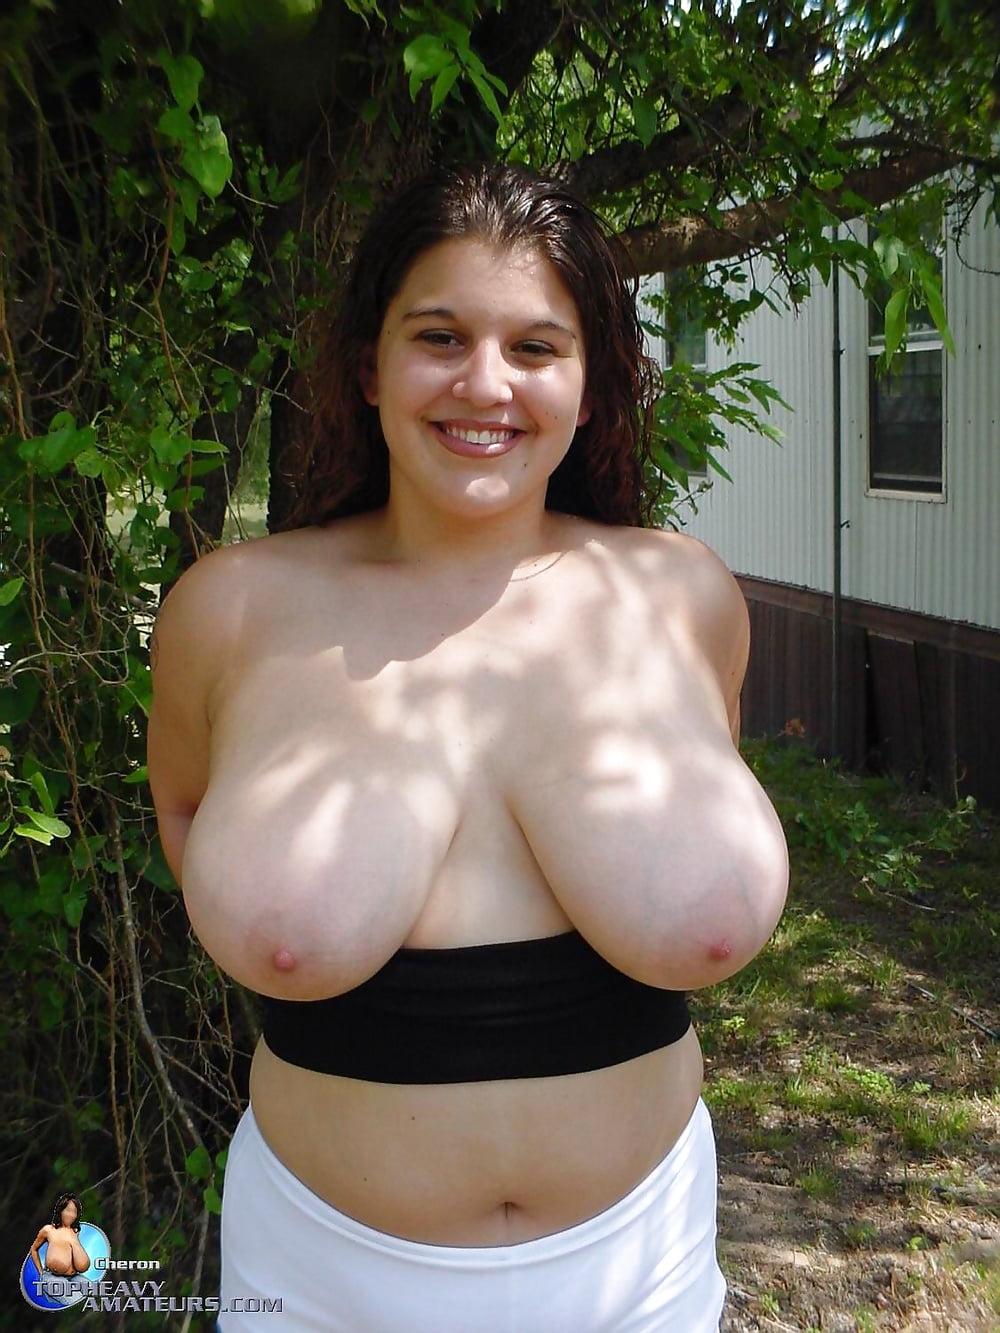 Best big tits sites